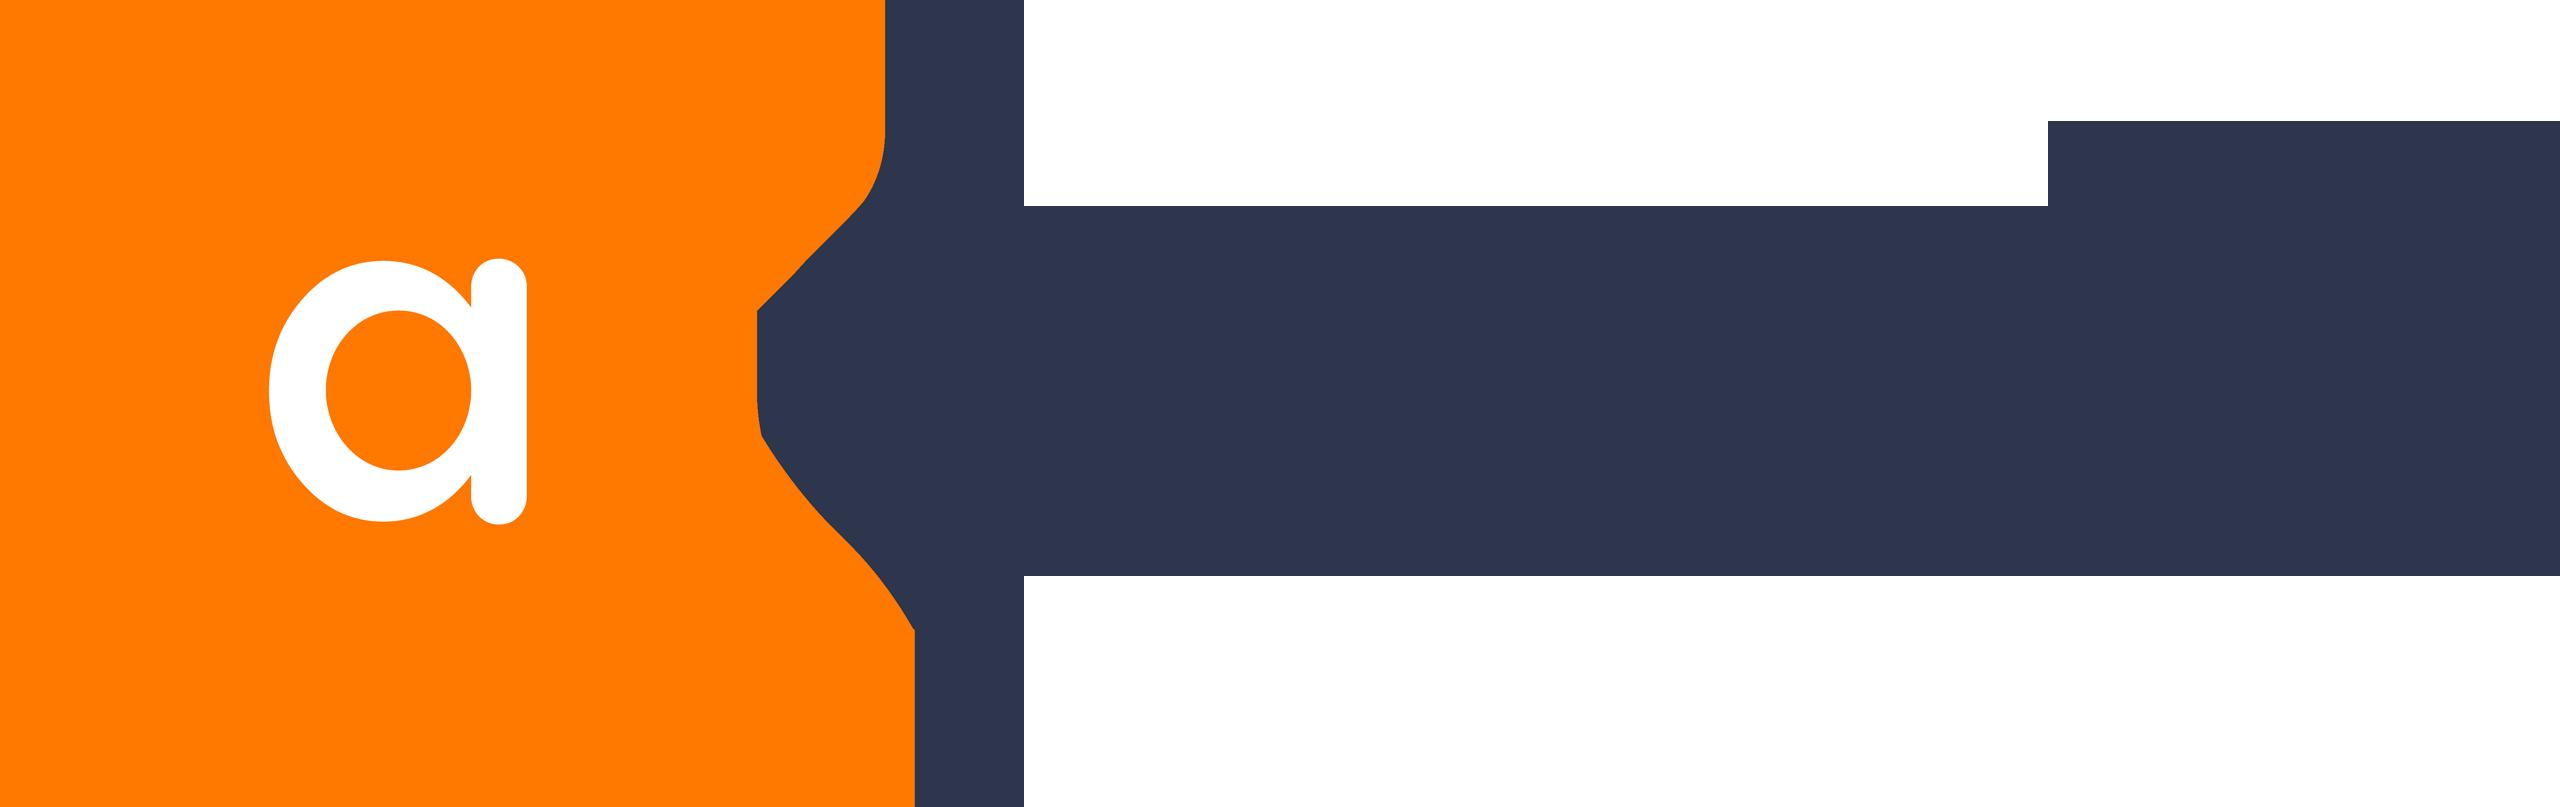 Avast Antivirus PNG